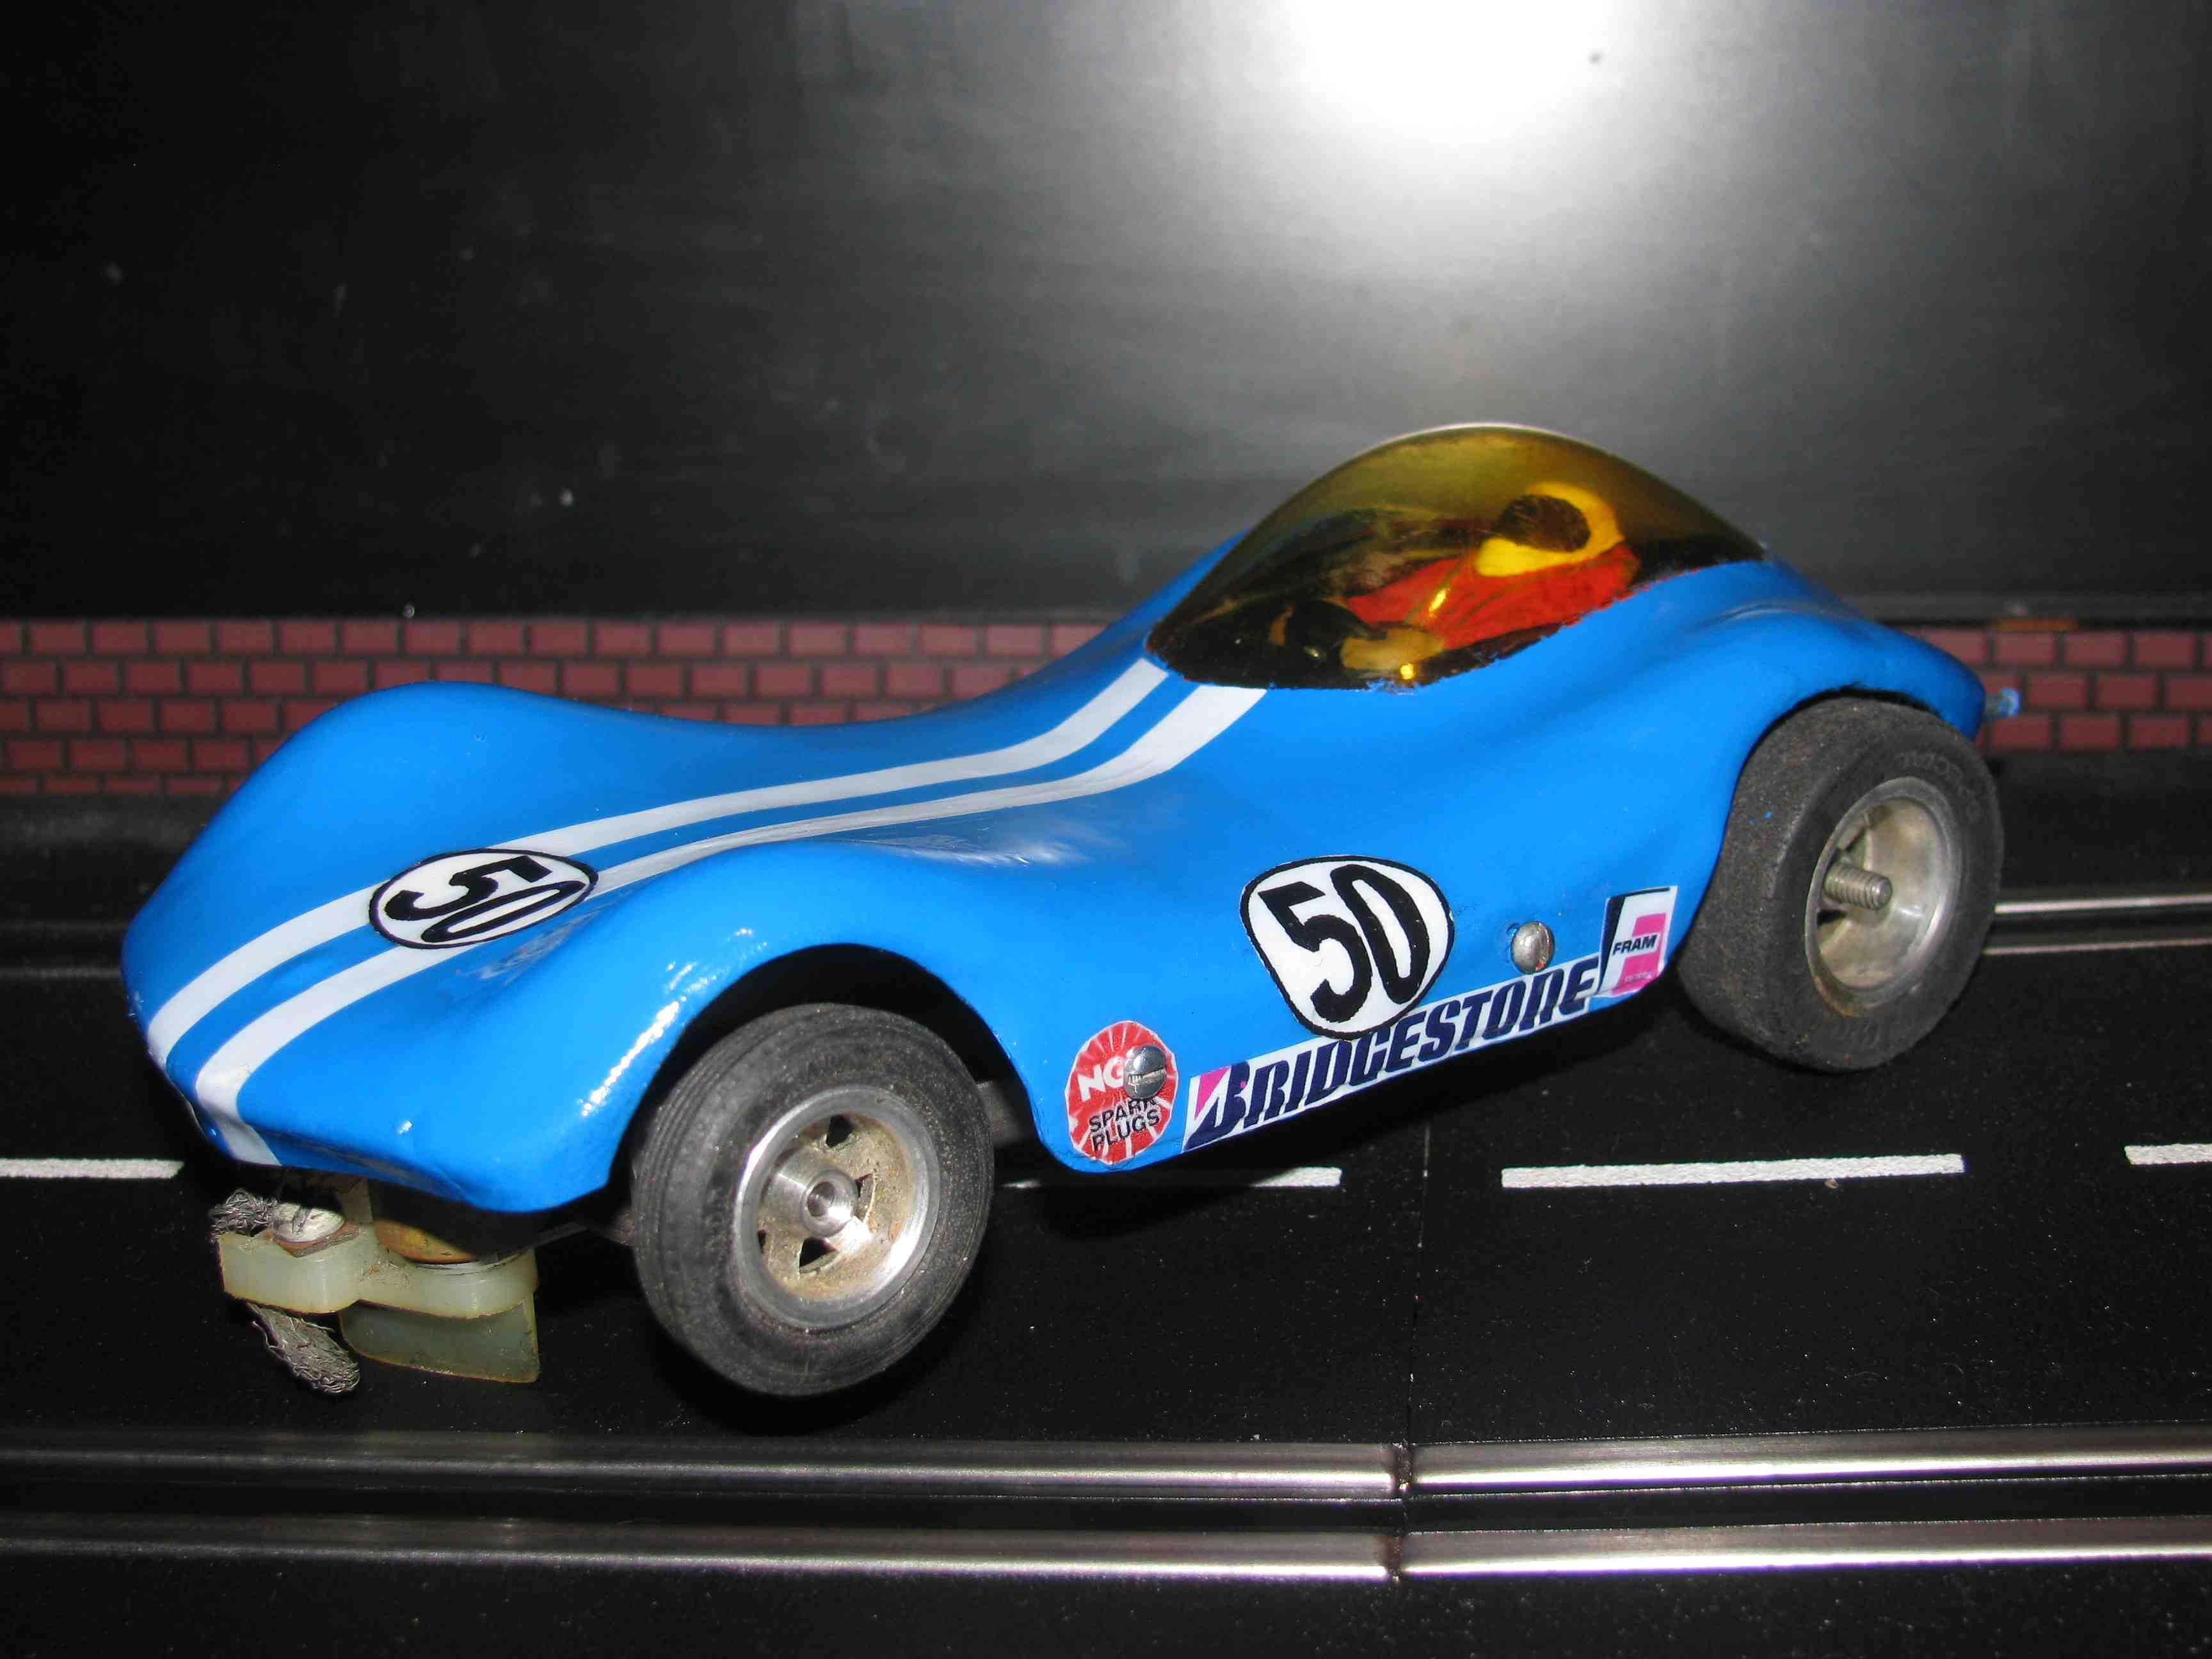 Vintage Blue Manta Ray Slot Car 1/32-1/24 Scale – Car 50